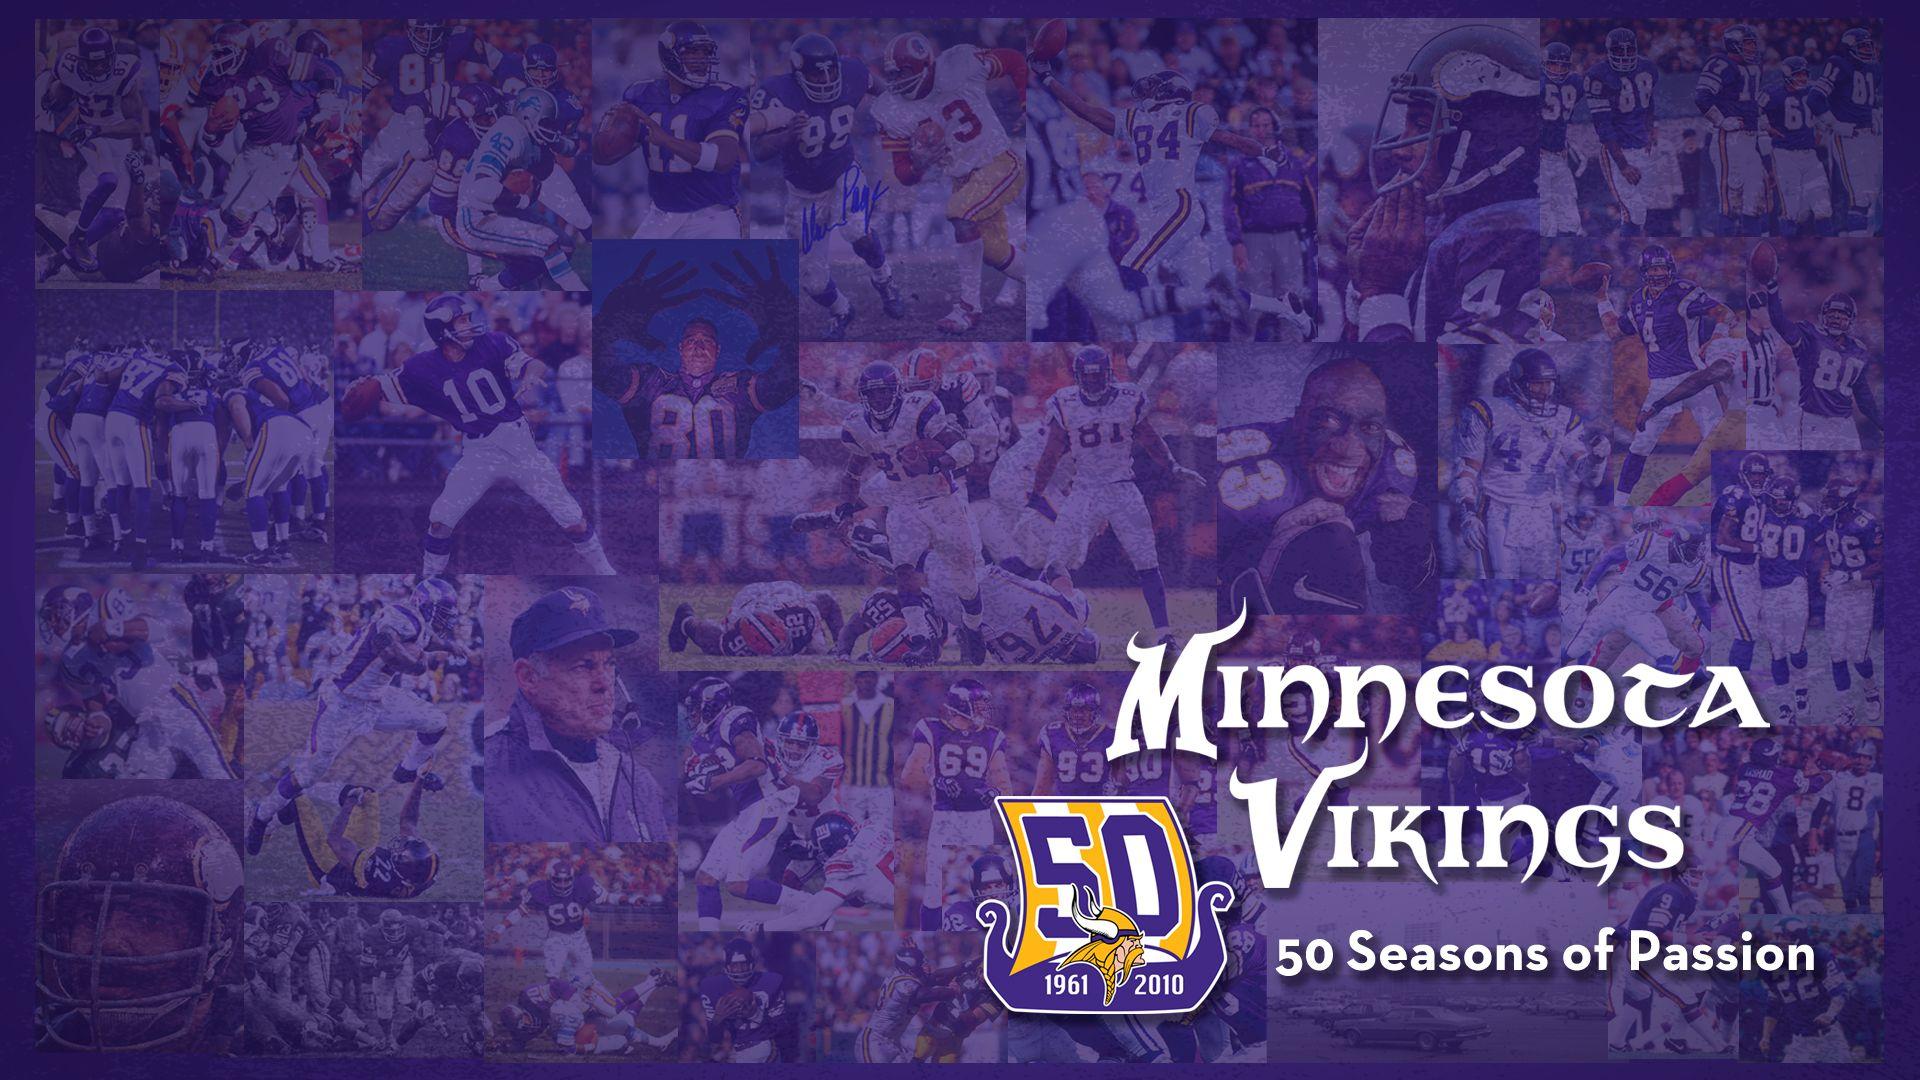 MINNESOTA VIKINGS | Minnesota Vikings: 50 Seasons of Passion 1.0 Wallpapers